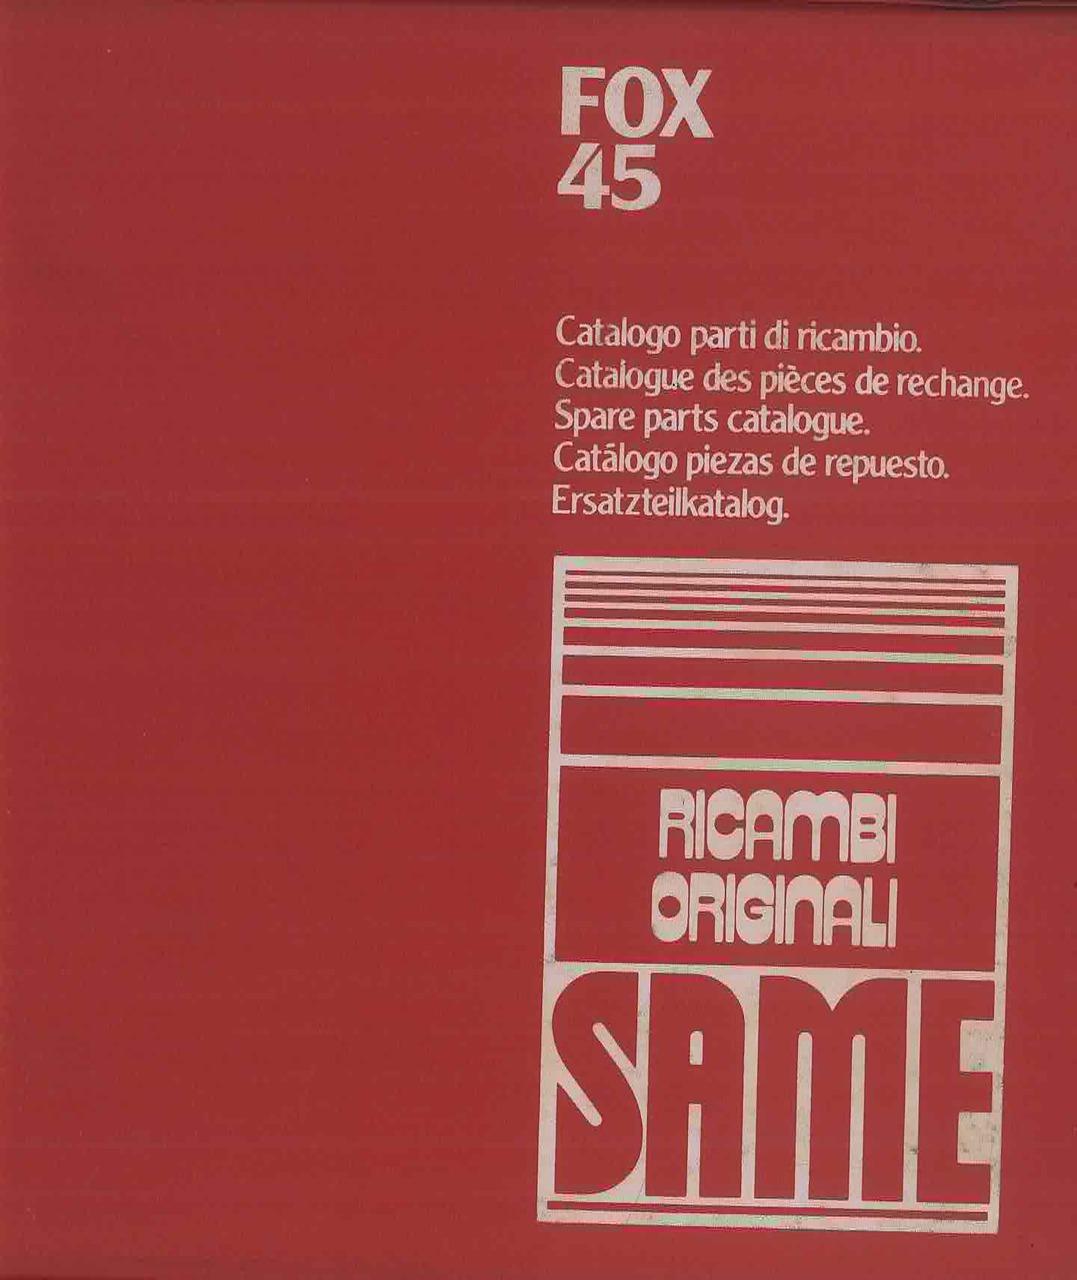 FOX 45 - Catalogo ricambi originali / Catalogue pièces d'origine / Original parts catalogue / Original Ersatzteilkatalog / Catálogo repuestos originales